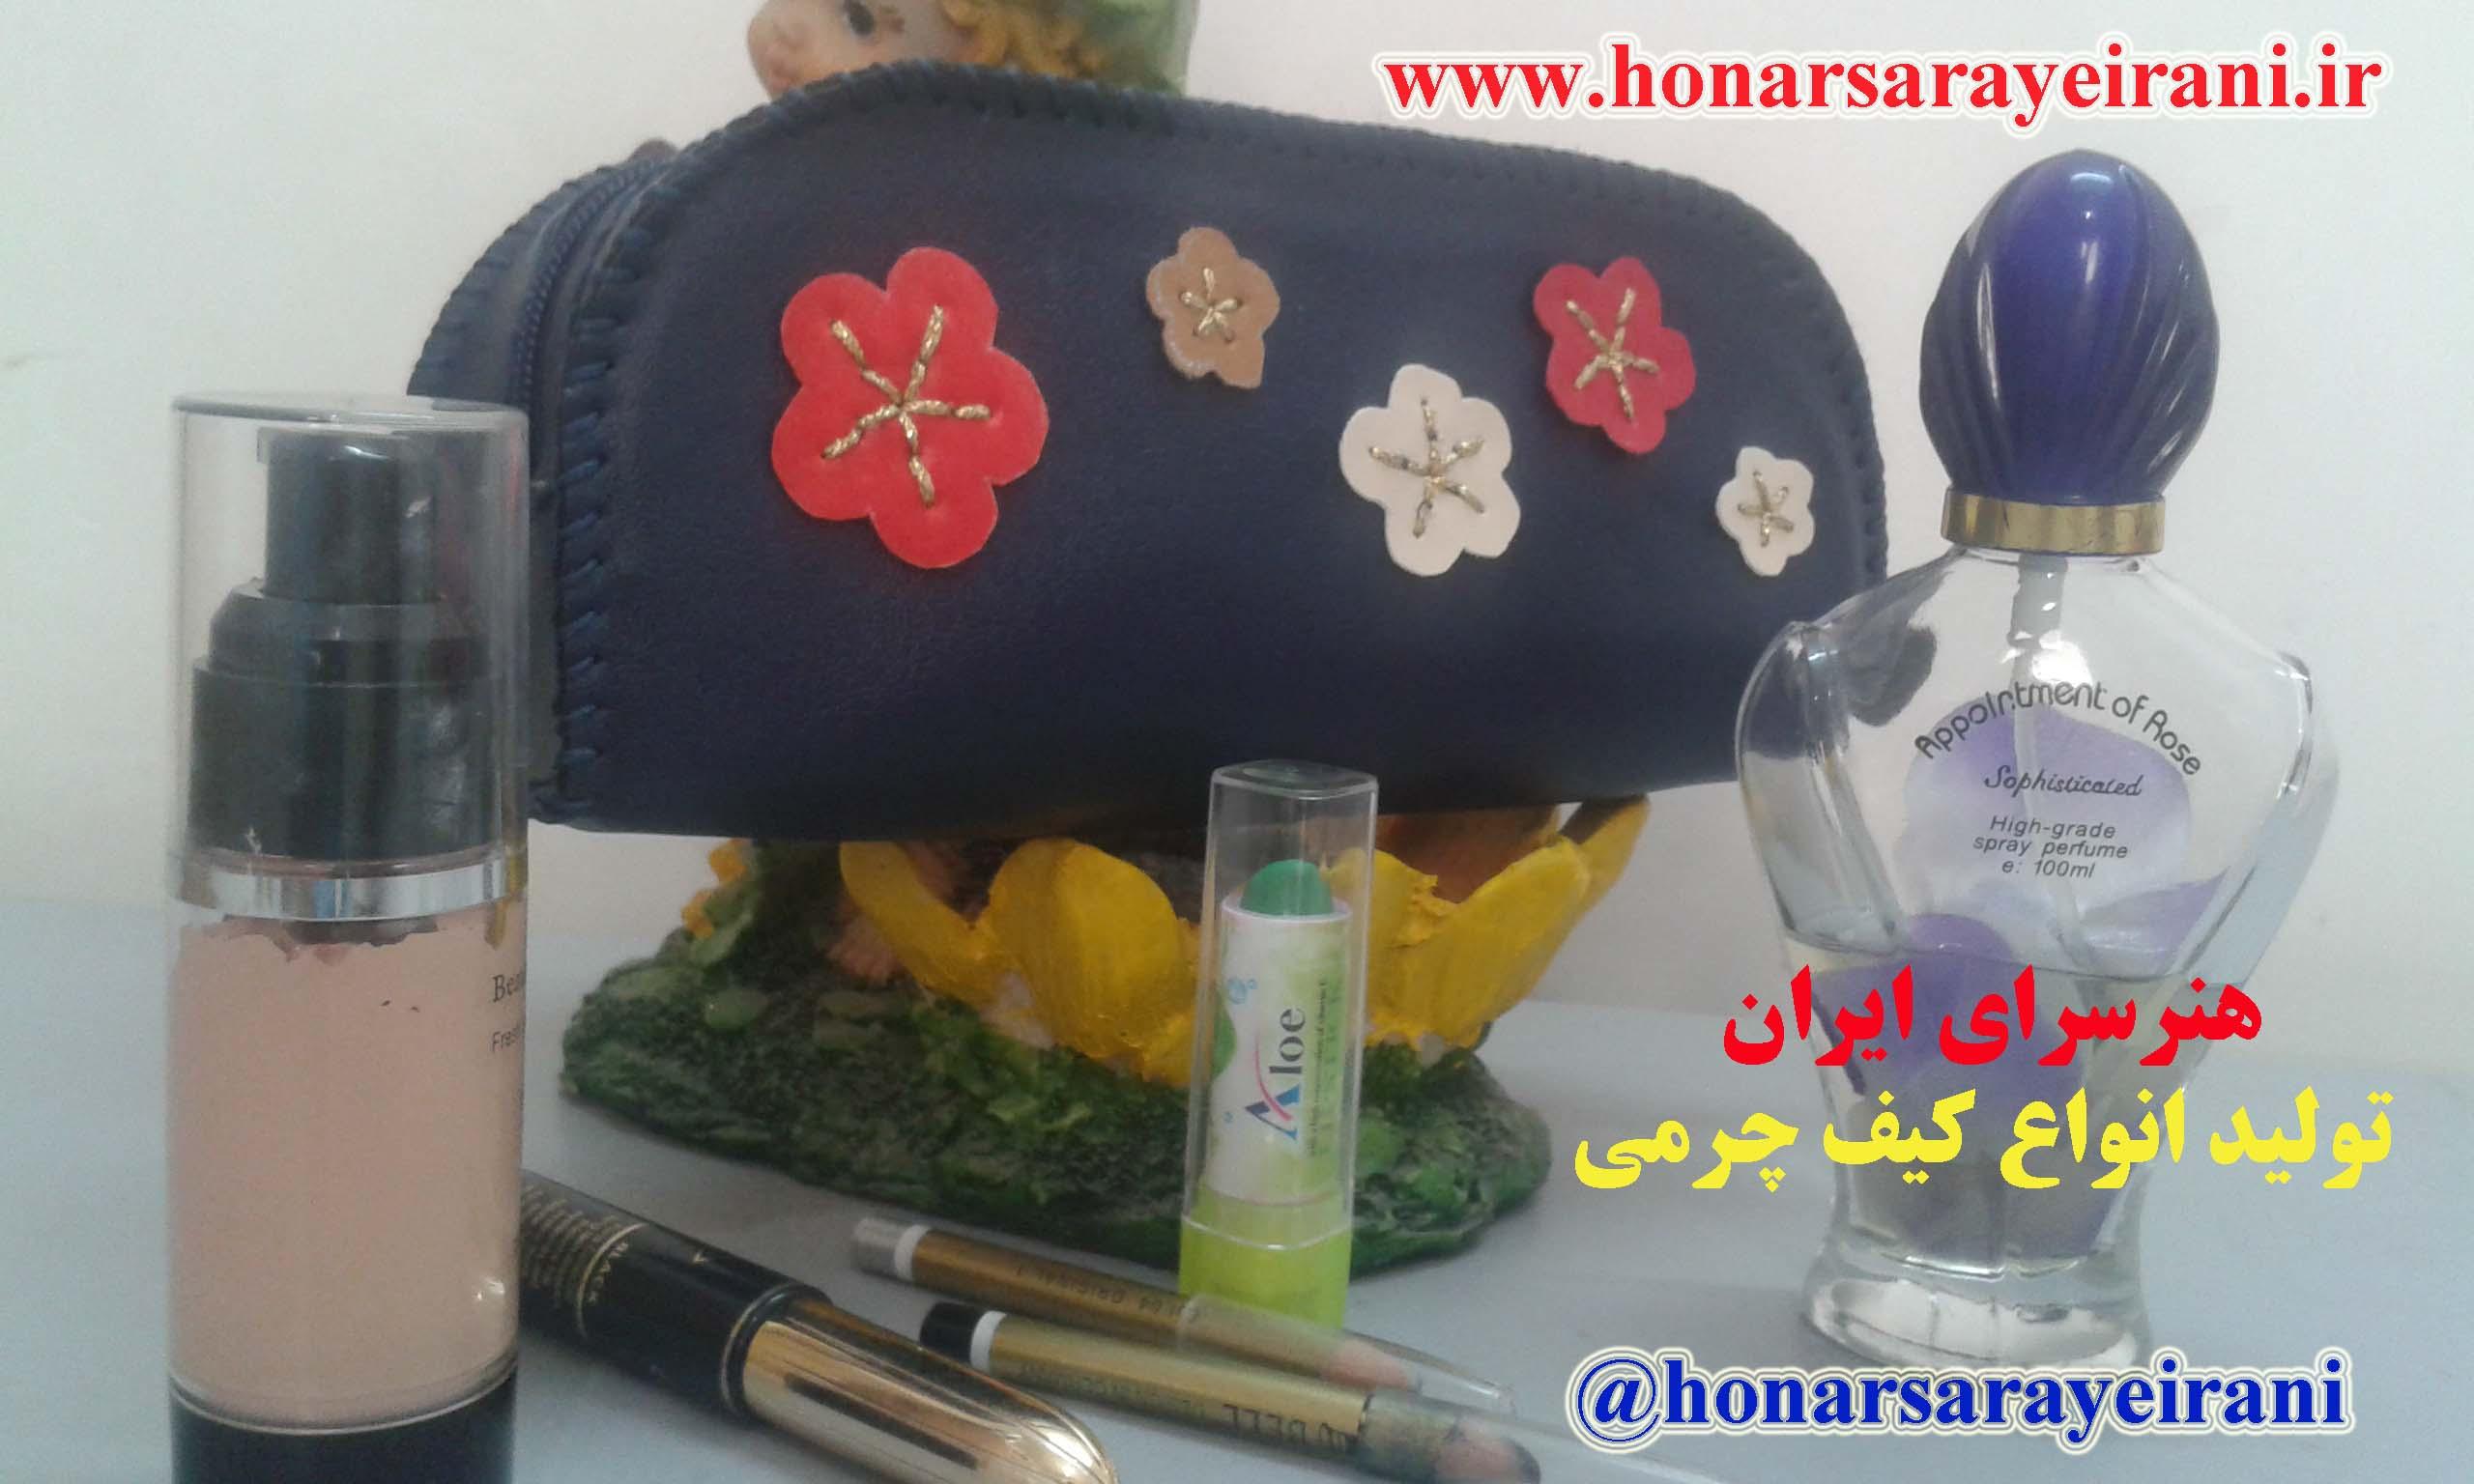 کیف لوازم آرایشی چرم گل دار